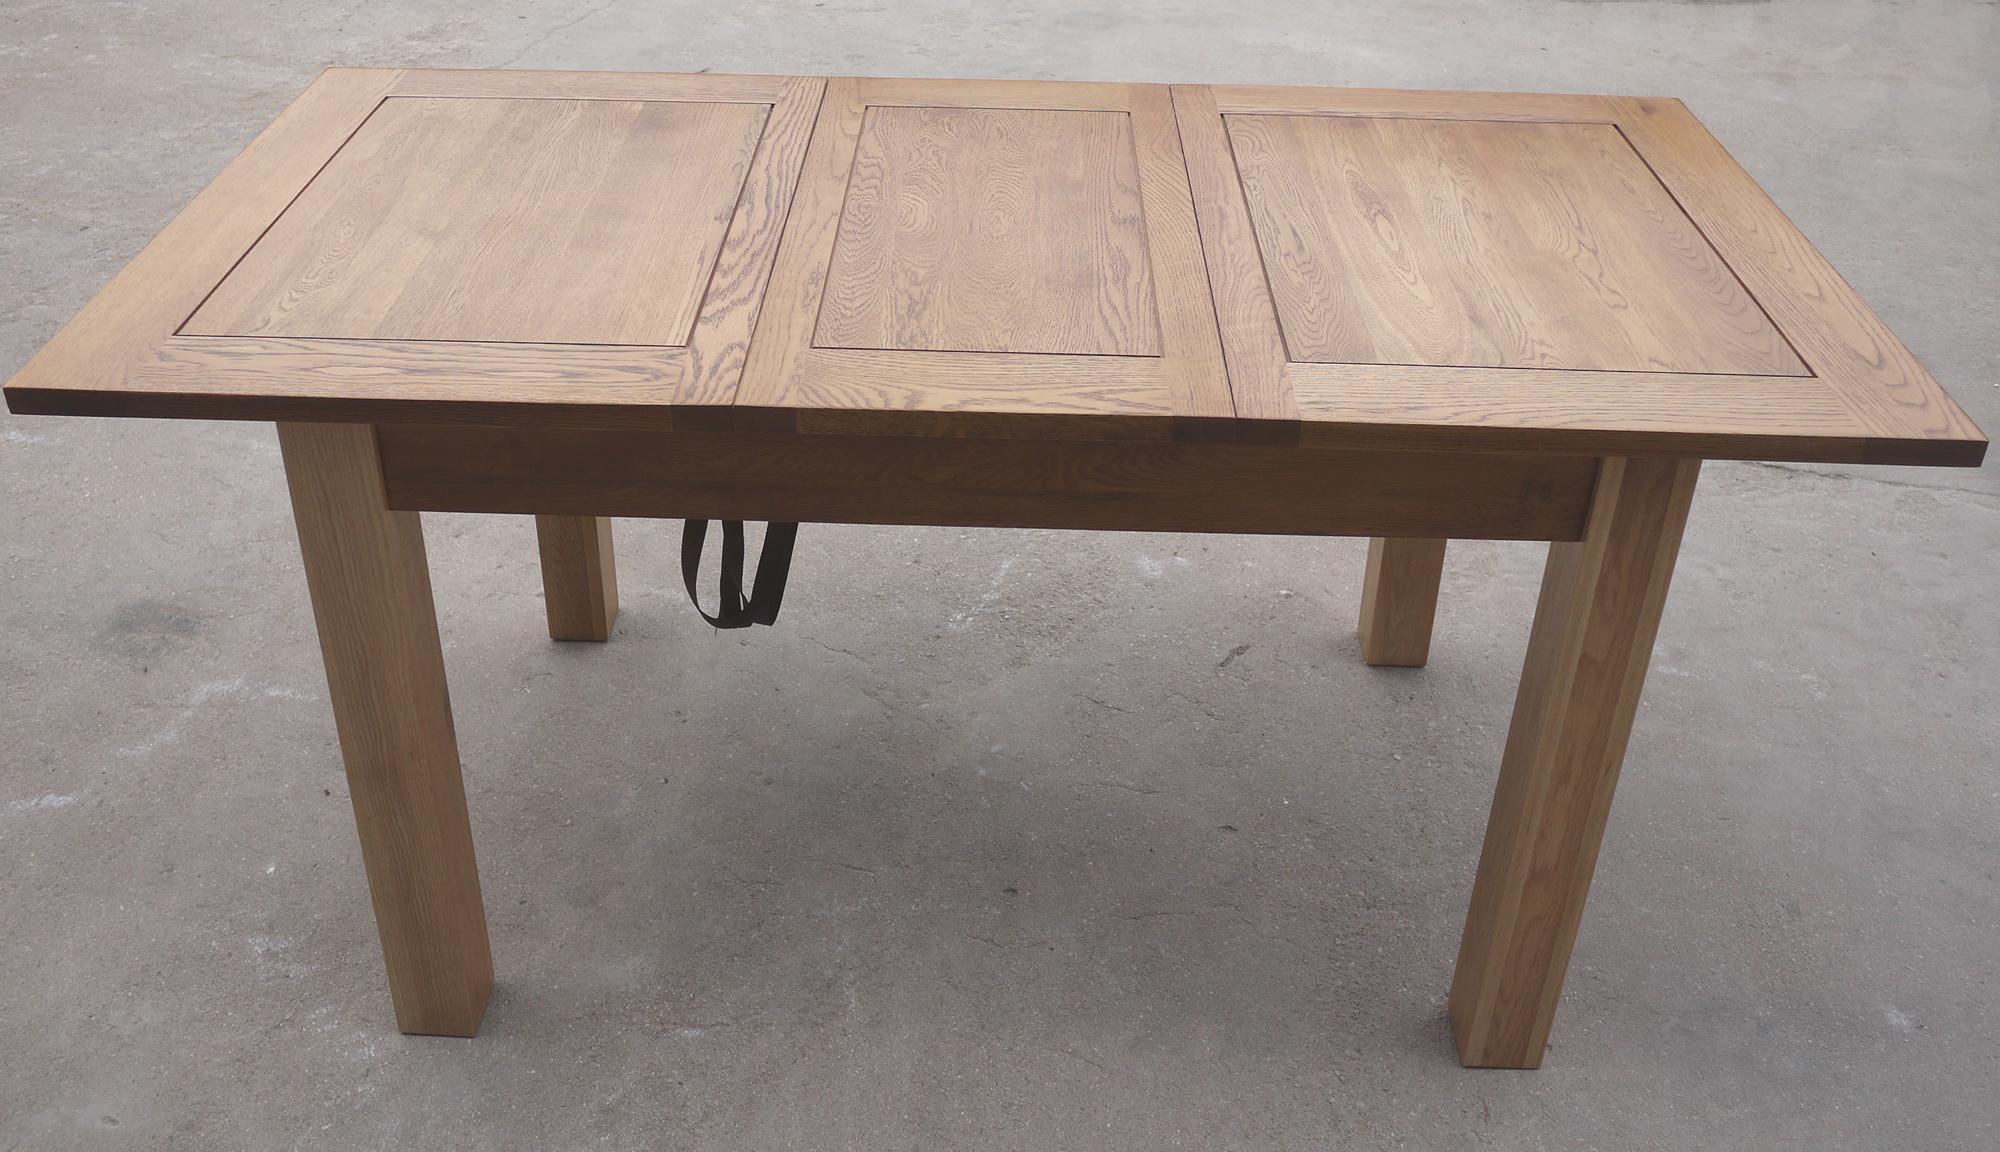 Expandable console table expandable console table suppliers and expandable console table expandable console table suppliers and manufacturers at alibaba geotapseo Images